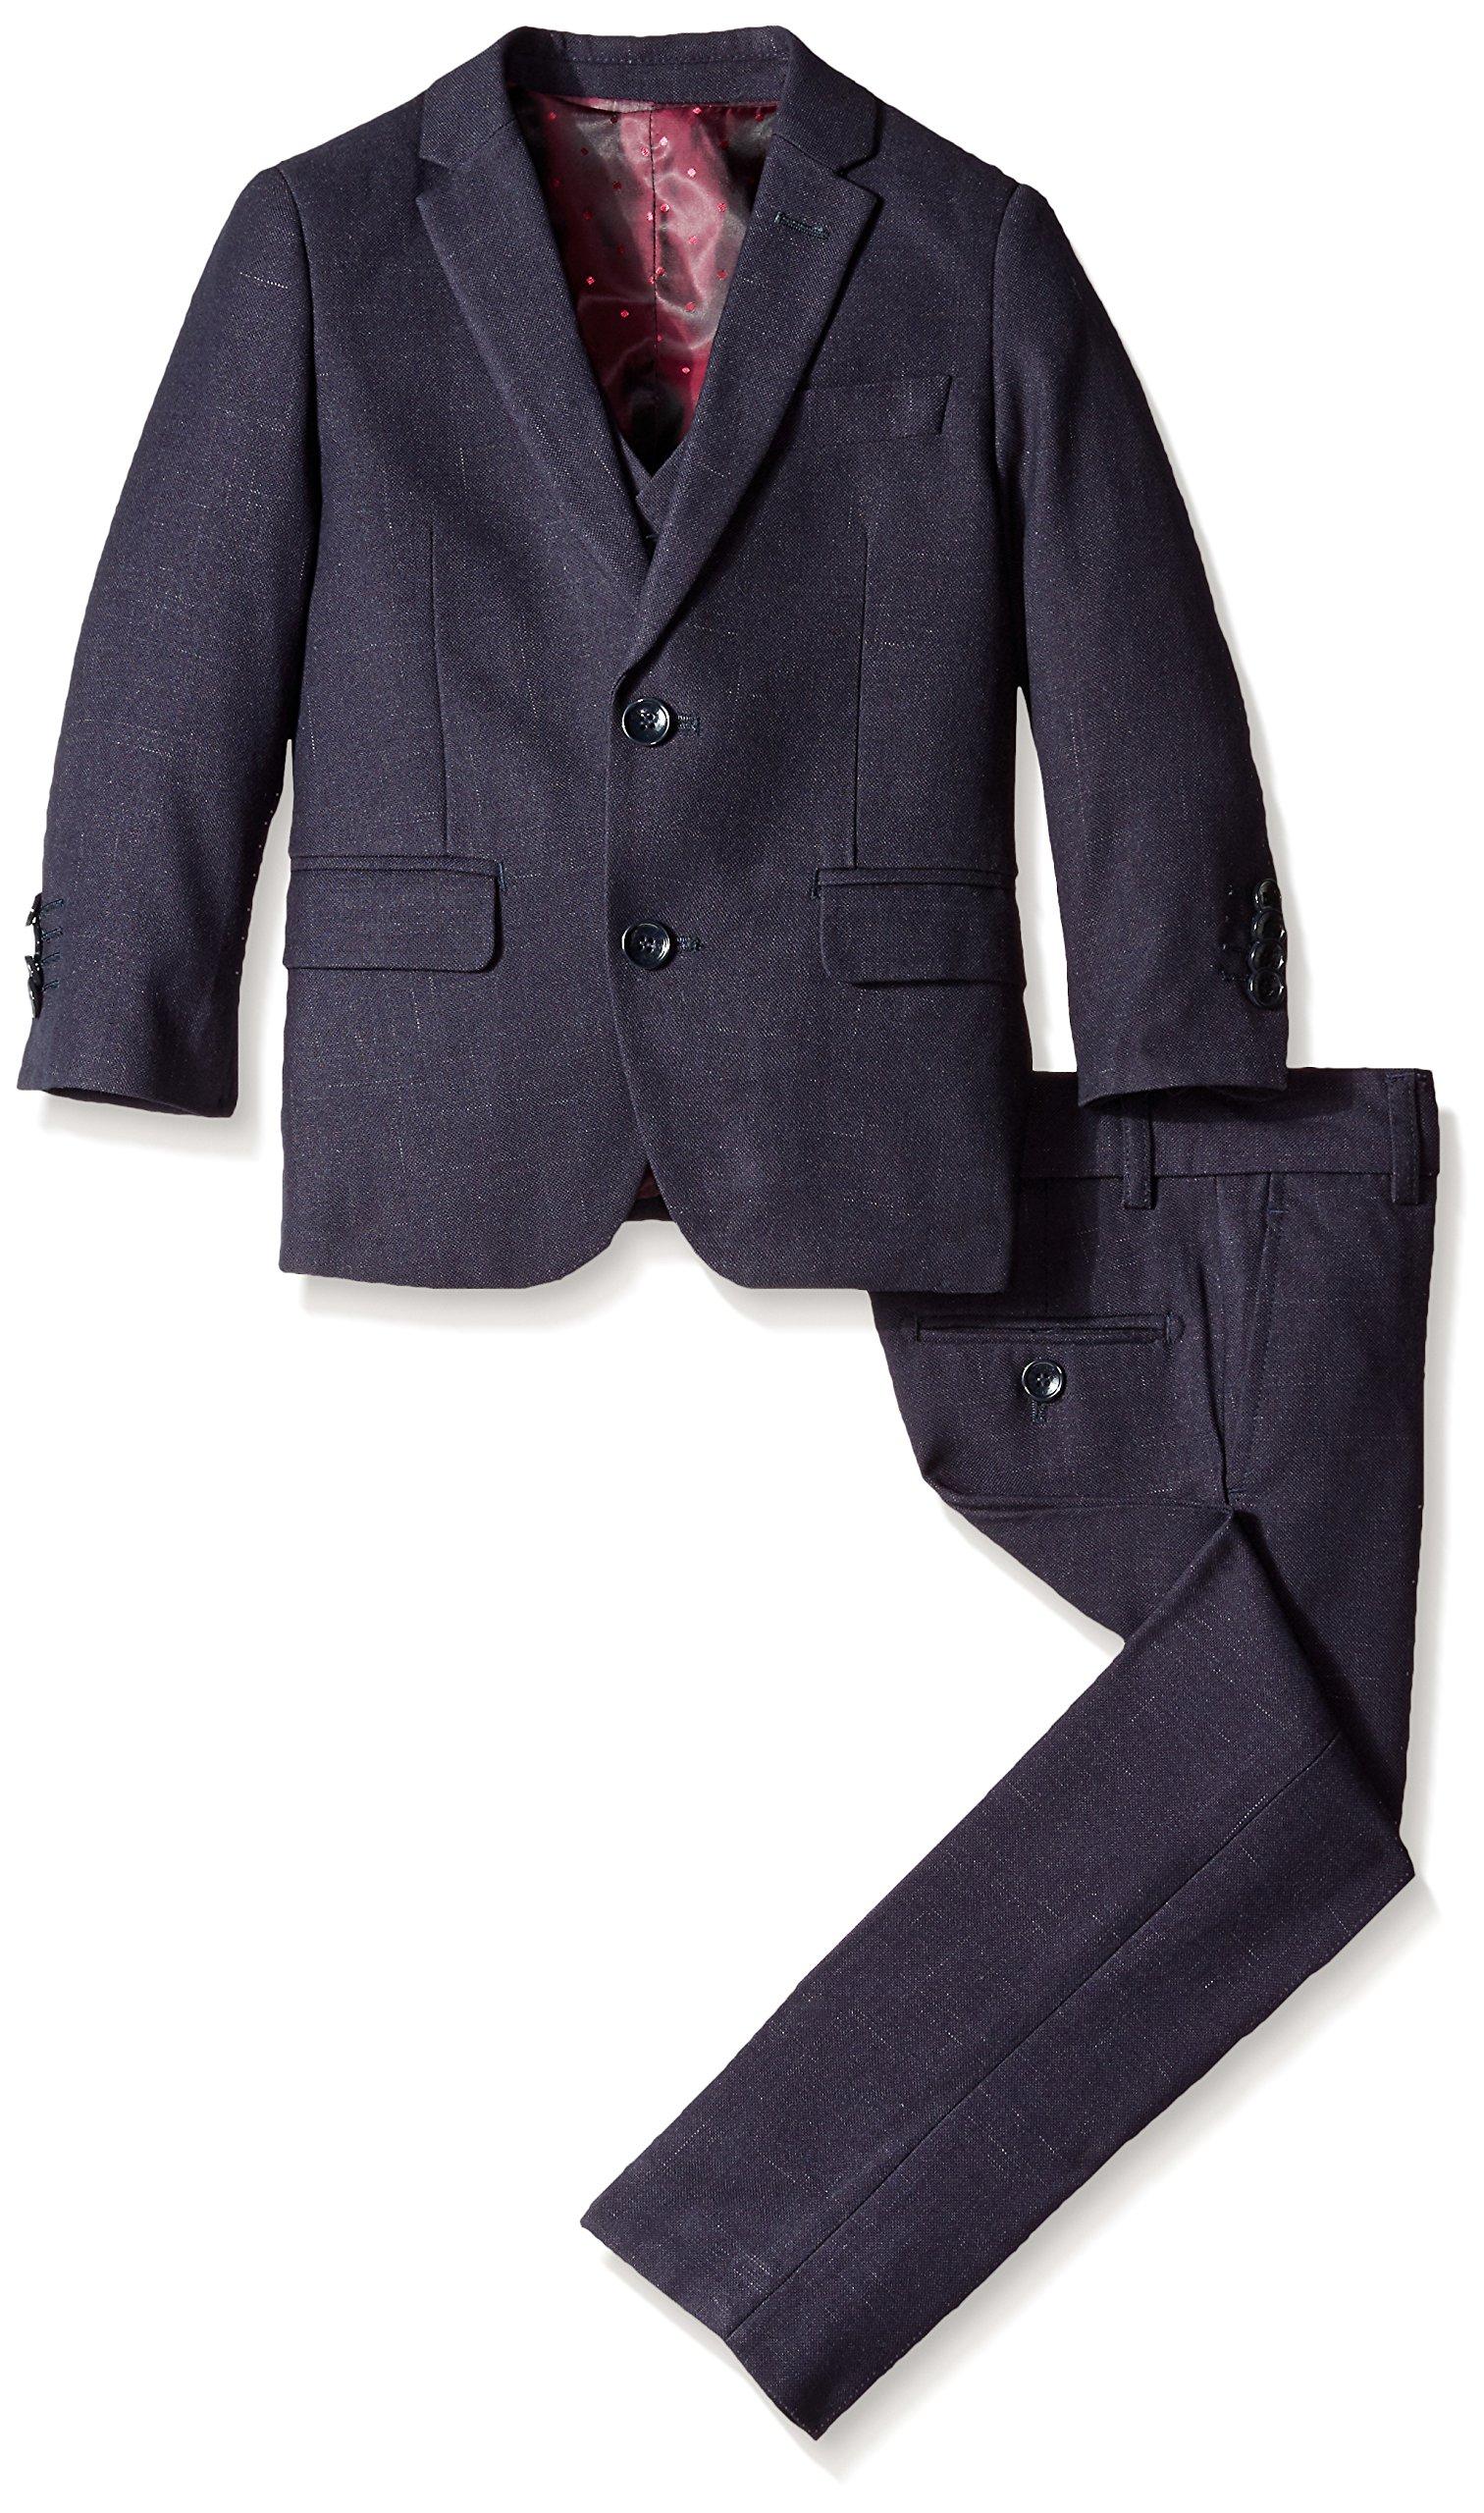 Isaac Mizrahi Little Boys' 3 Piece Raindrop Suit, Navy, 3